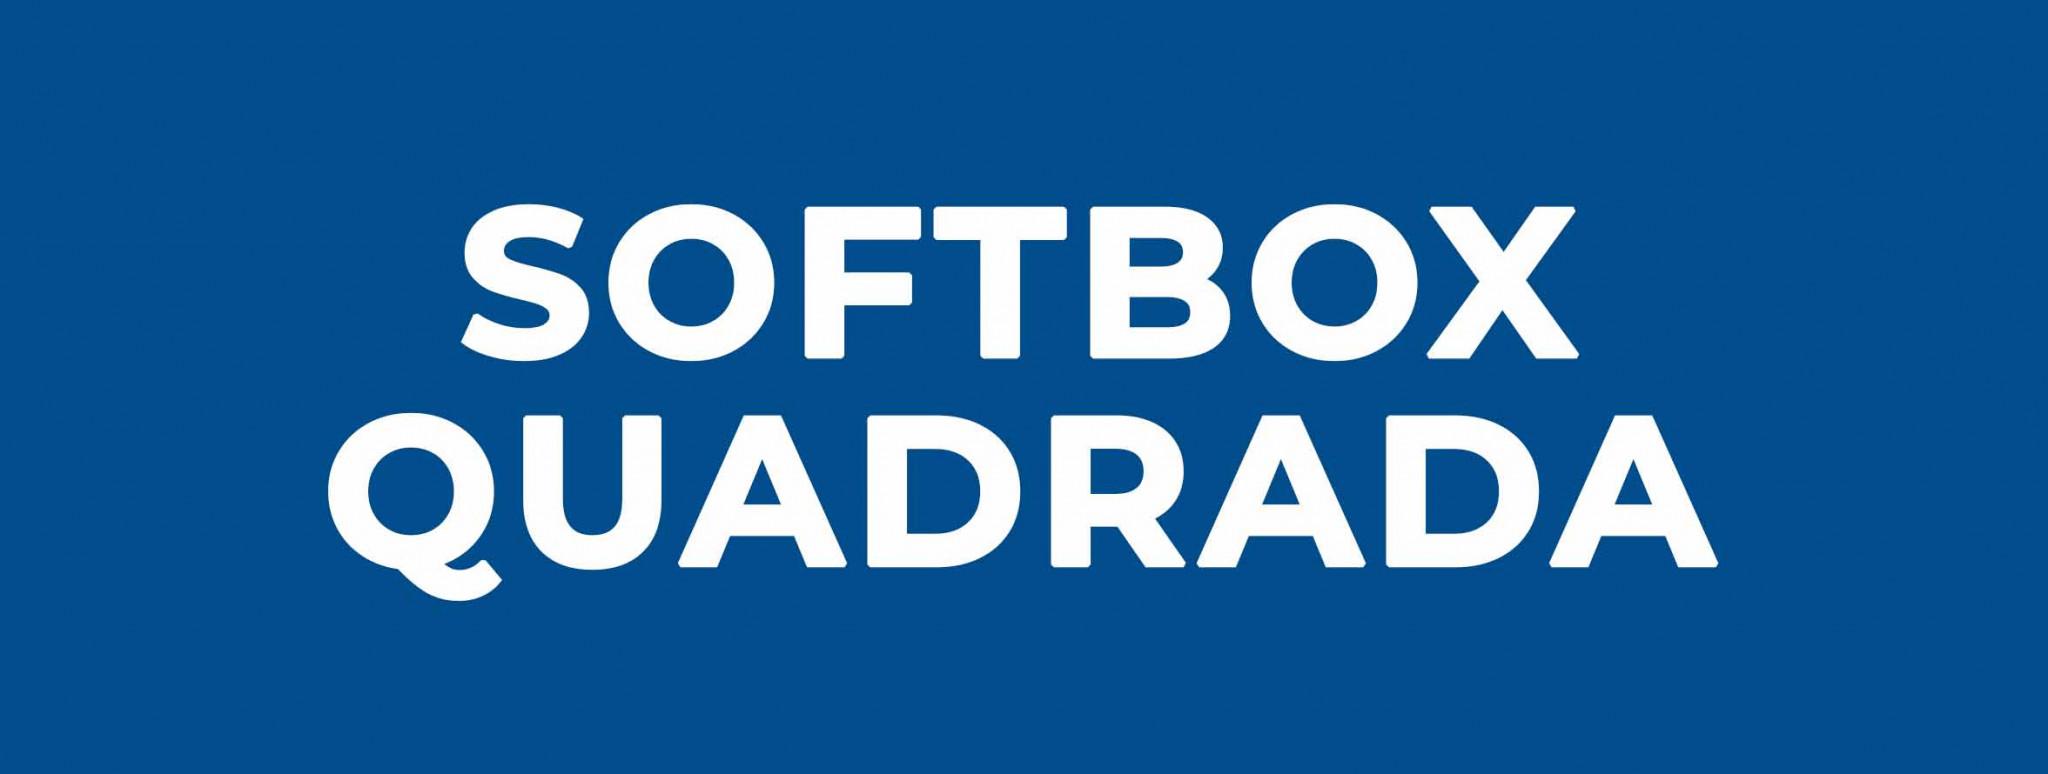 Softbox Quadrada